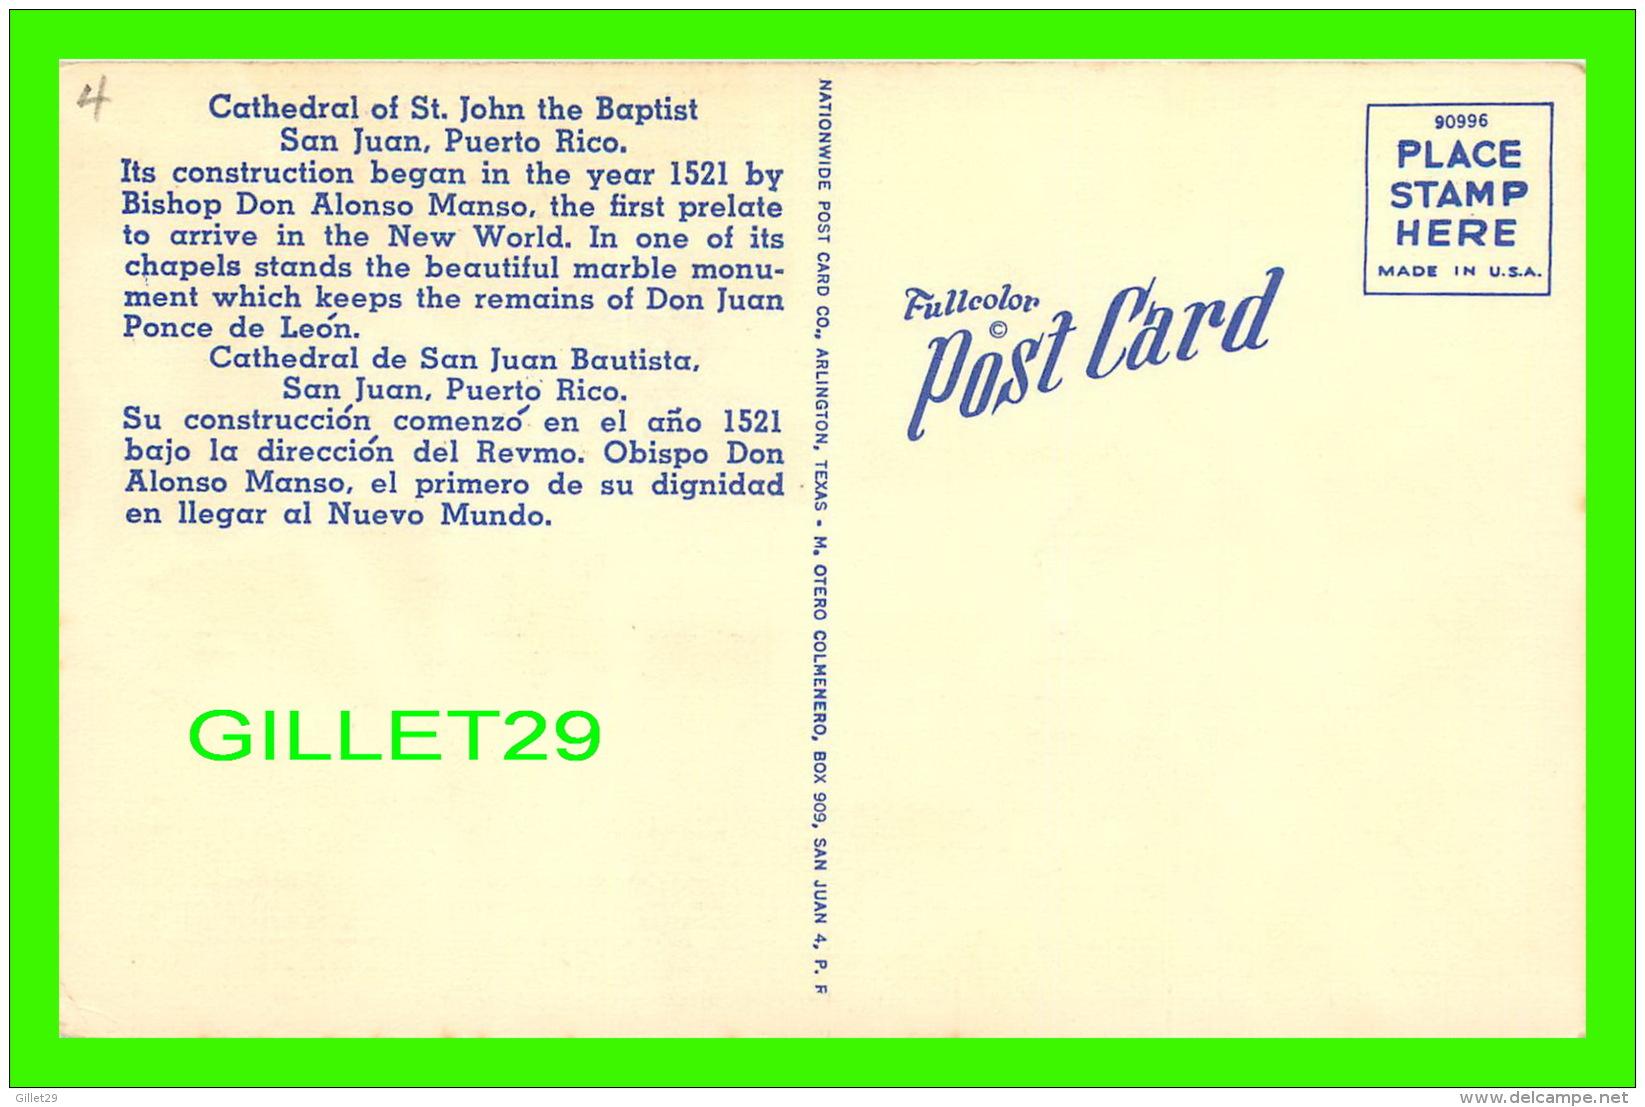 SAN JUAN, PUERTO RICO - CATHEDRAL OF ST JOHN THE BAPTIST - NATIONWIDE POST CARD CO - - Puerto Rico